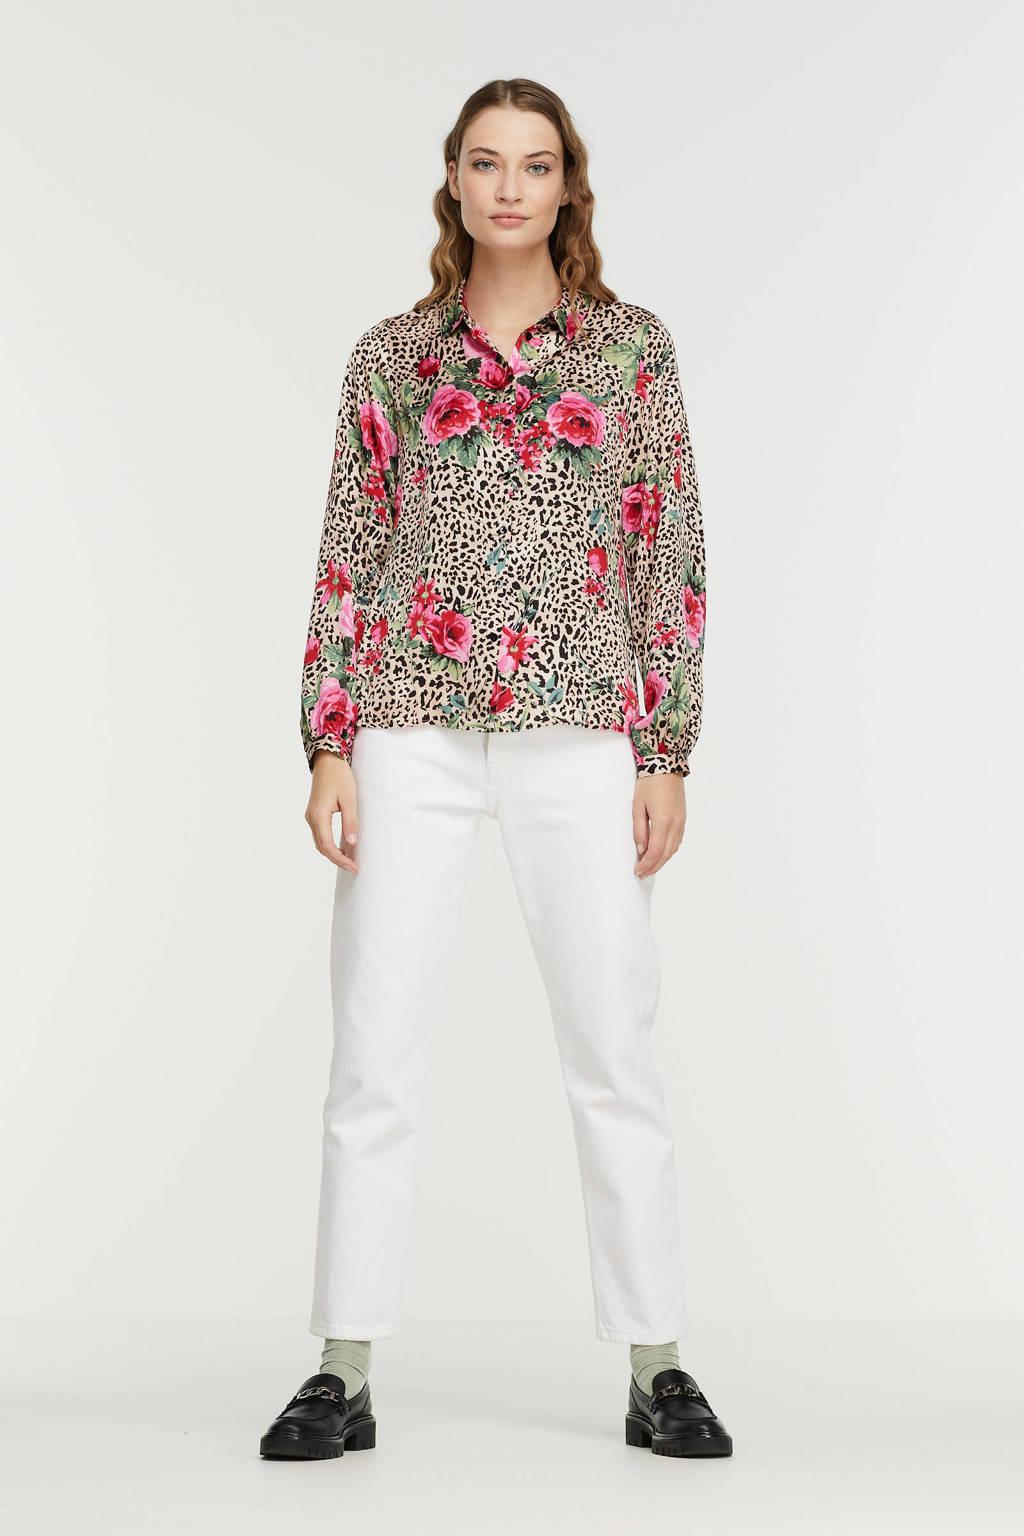 Esqualo gebloemde blouse beige/ roze, Print